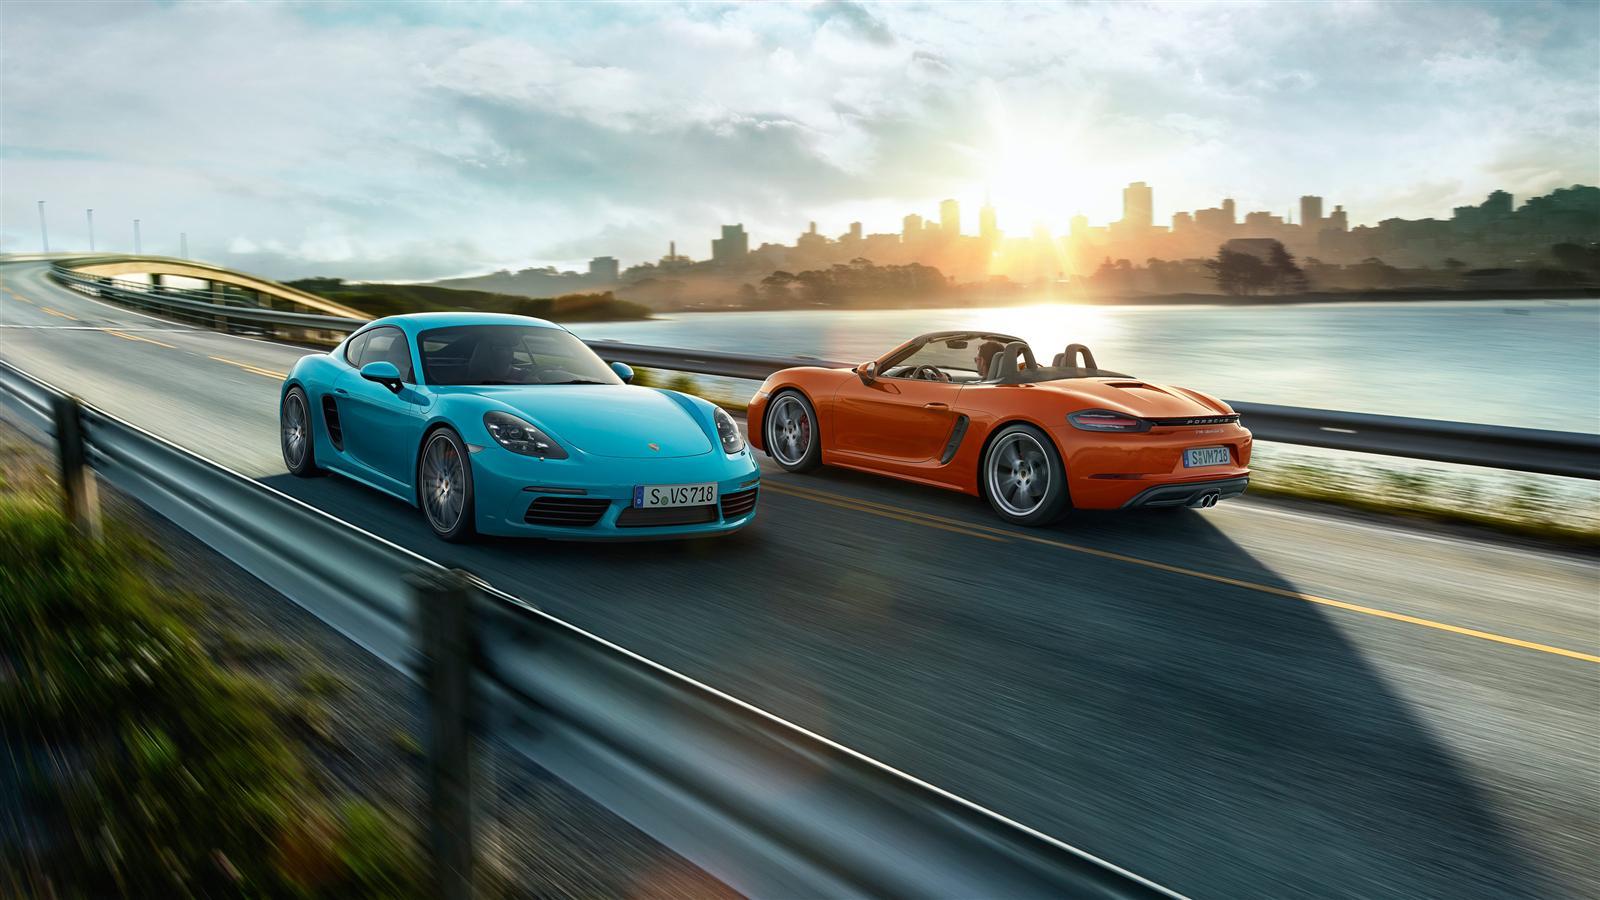 718 gallery 18 1 Porsche 718 Boxster και 718 Boxster S, πιο δυνατές και πιο ποθητές! COUPE, Porsche, Porsche 718 Boxster, Porsche 718 Boxster S, Roadster